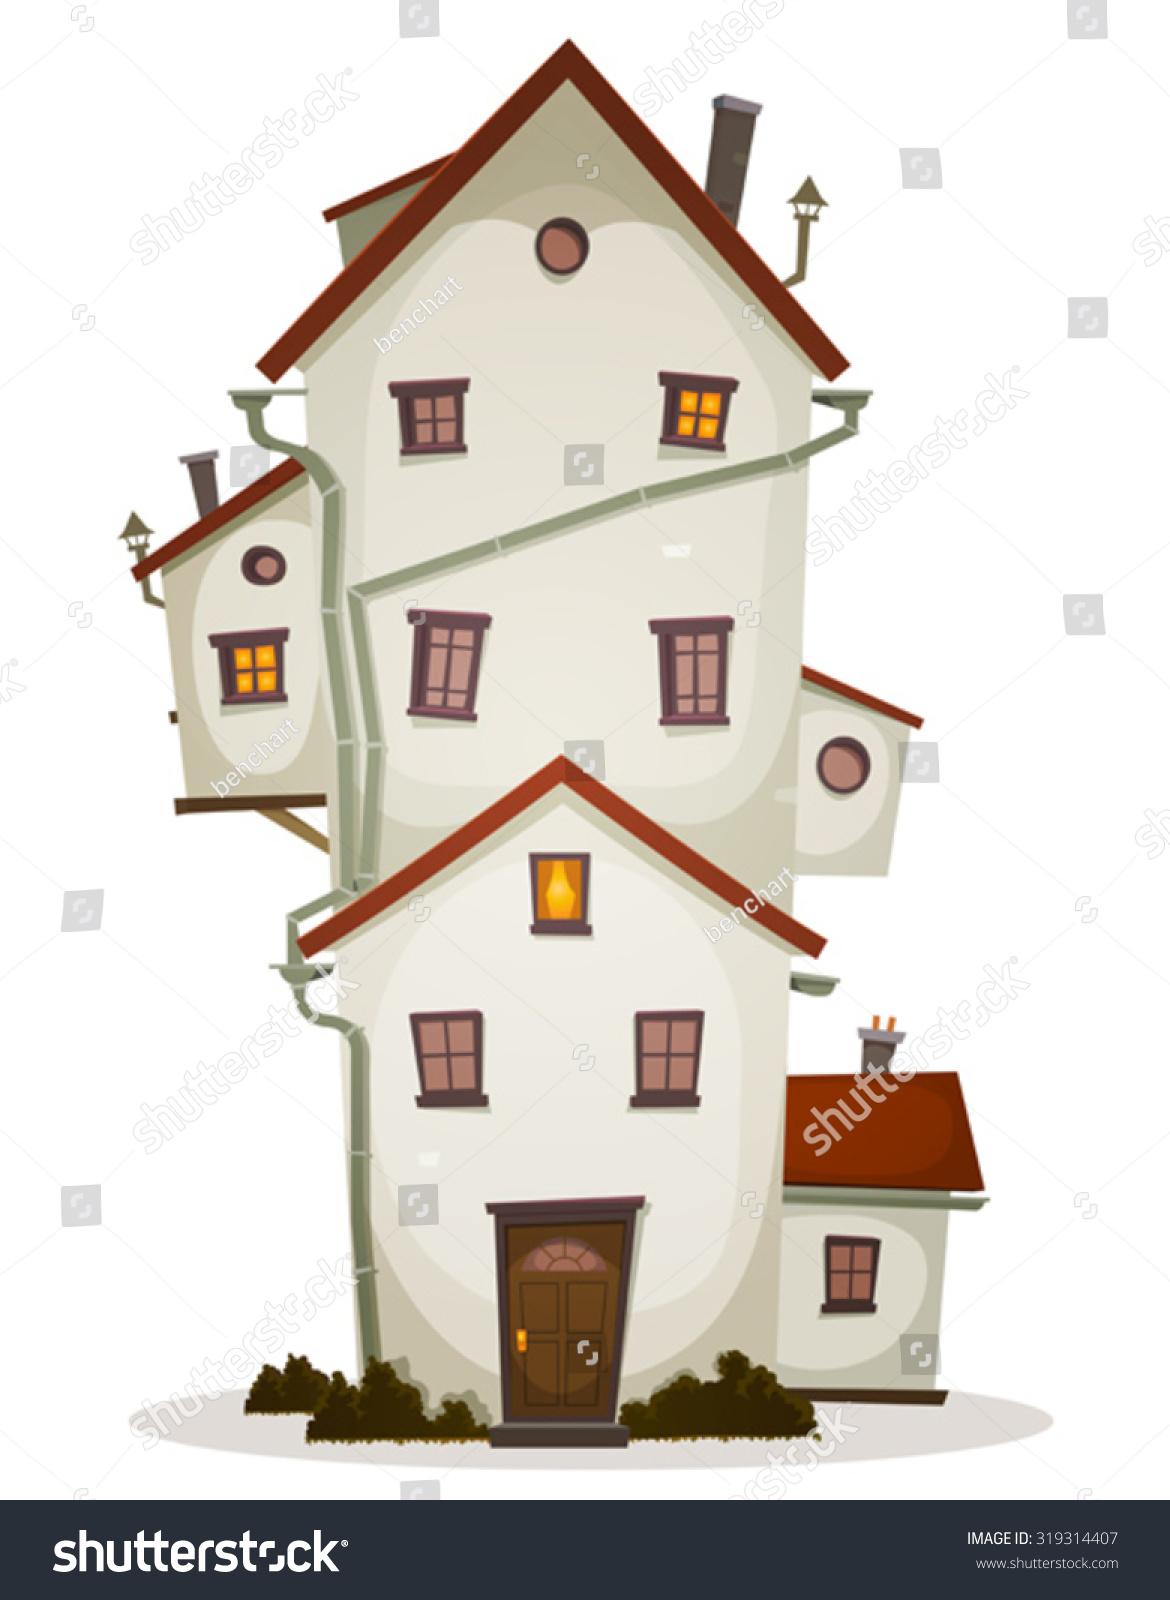 Funny Big House Illustration Cartoon High Stock-Vektorgrafik ...